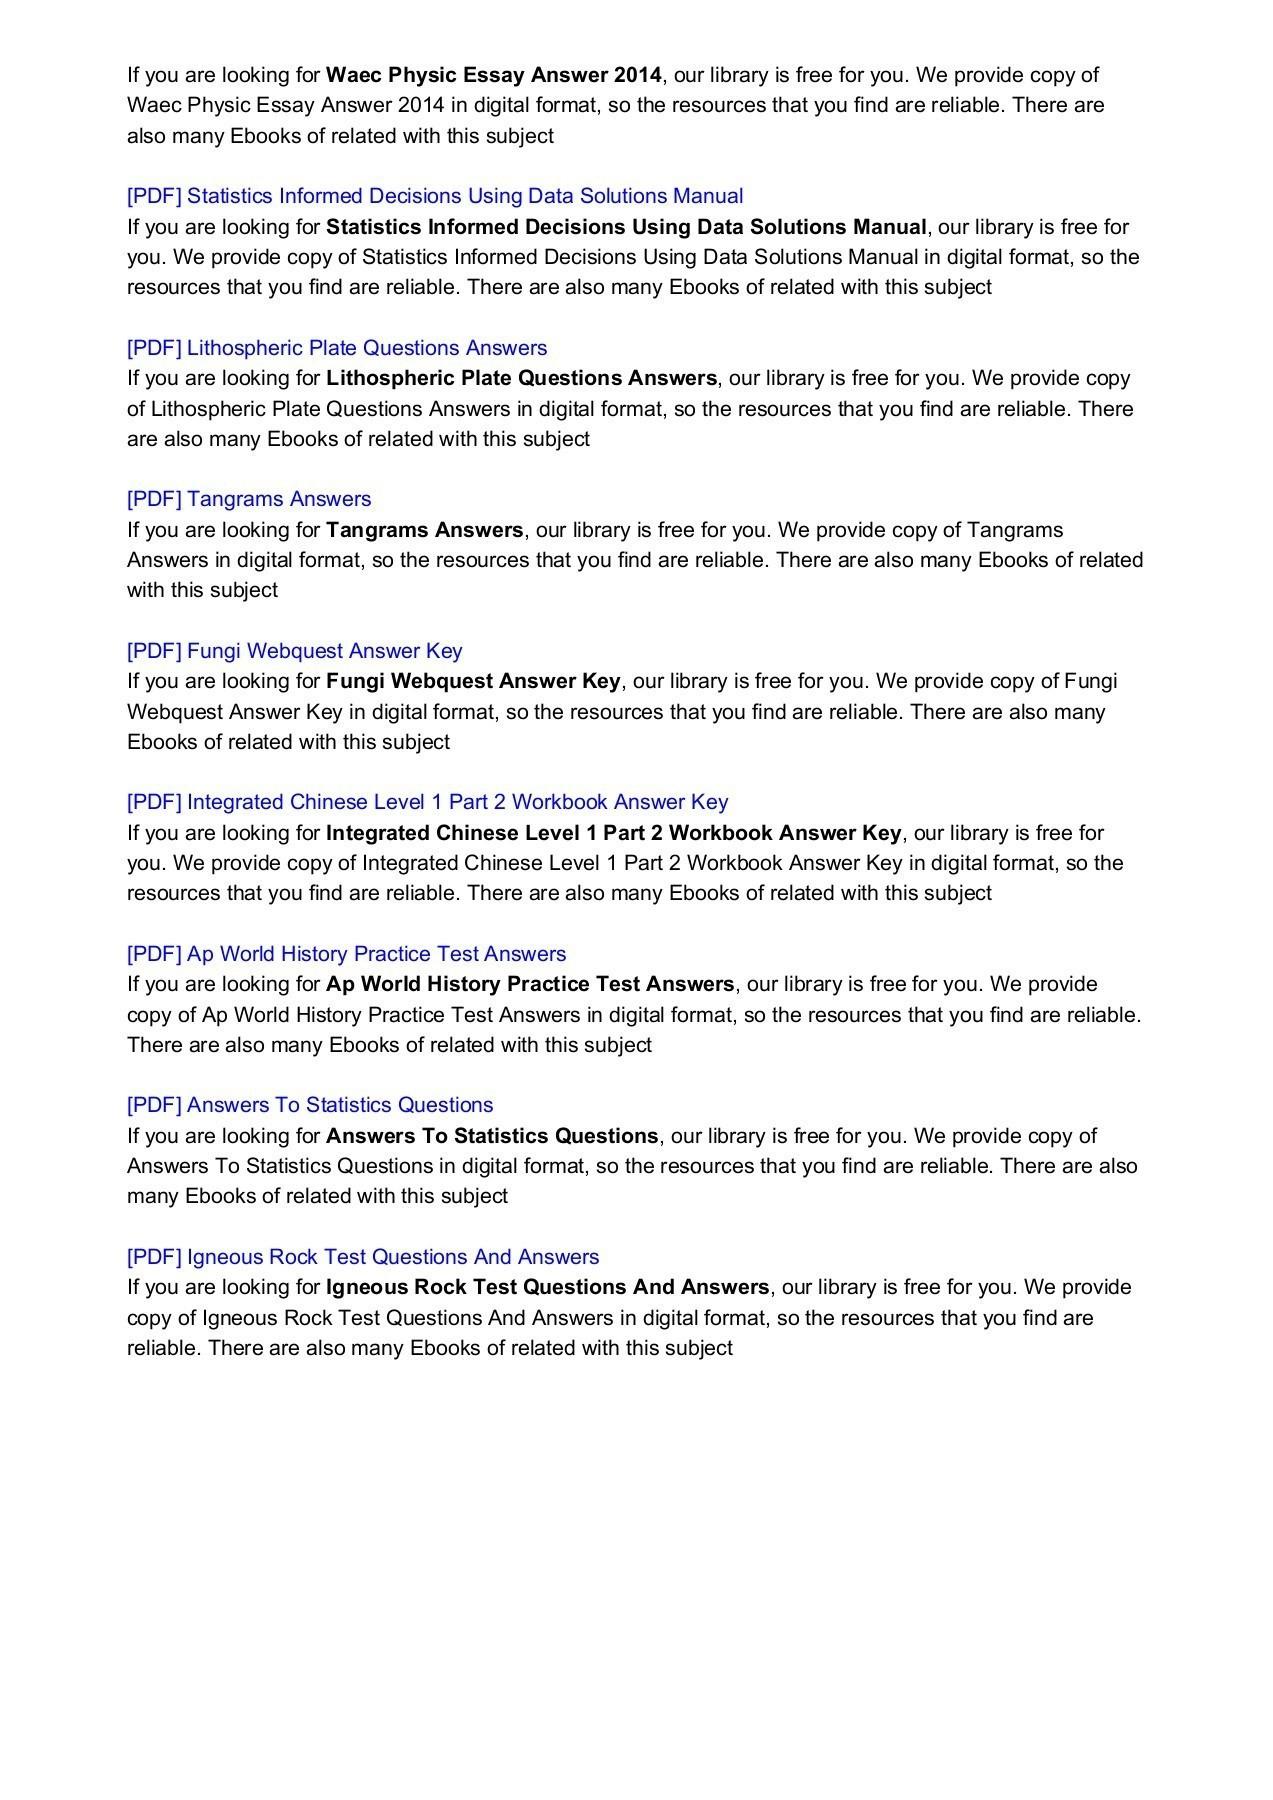 Array hemavet manual ebook rh hemavet manual ebook nitrorocks de